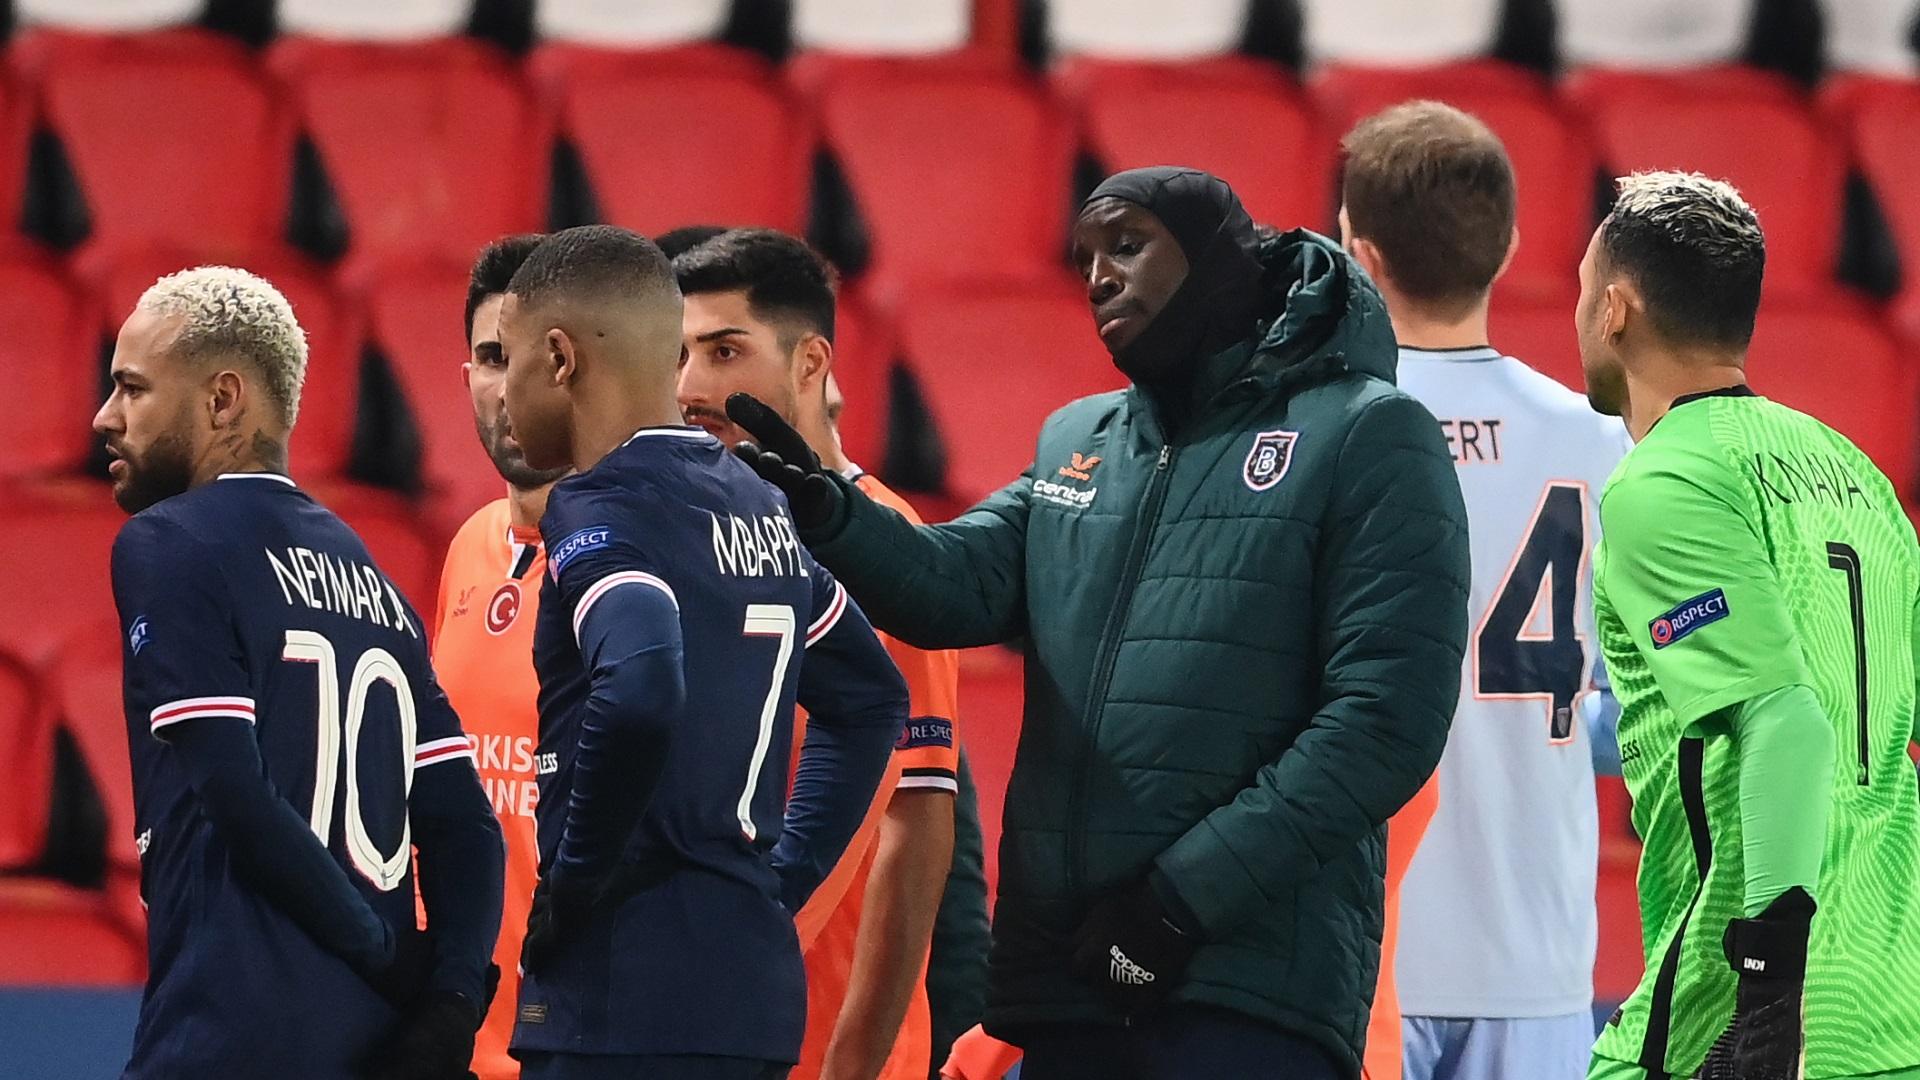 Caso PSG-Basaksehir, l'UEFA apre un procedimento contro guardalinee e quarto uomo